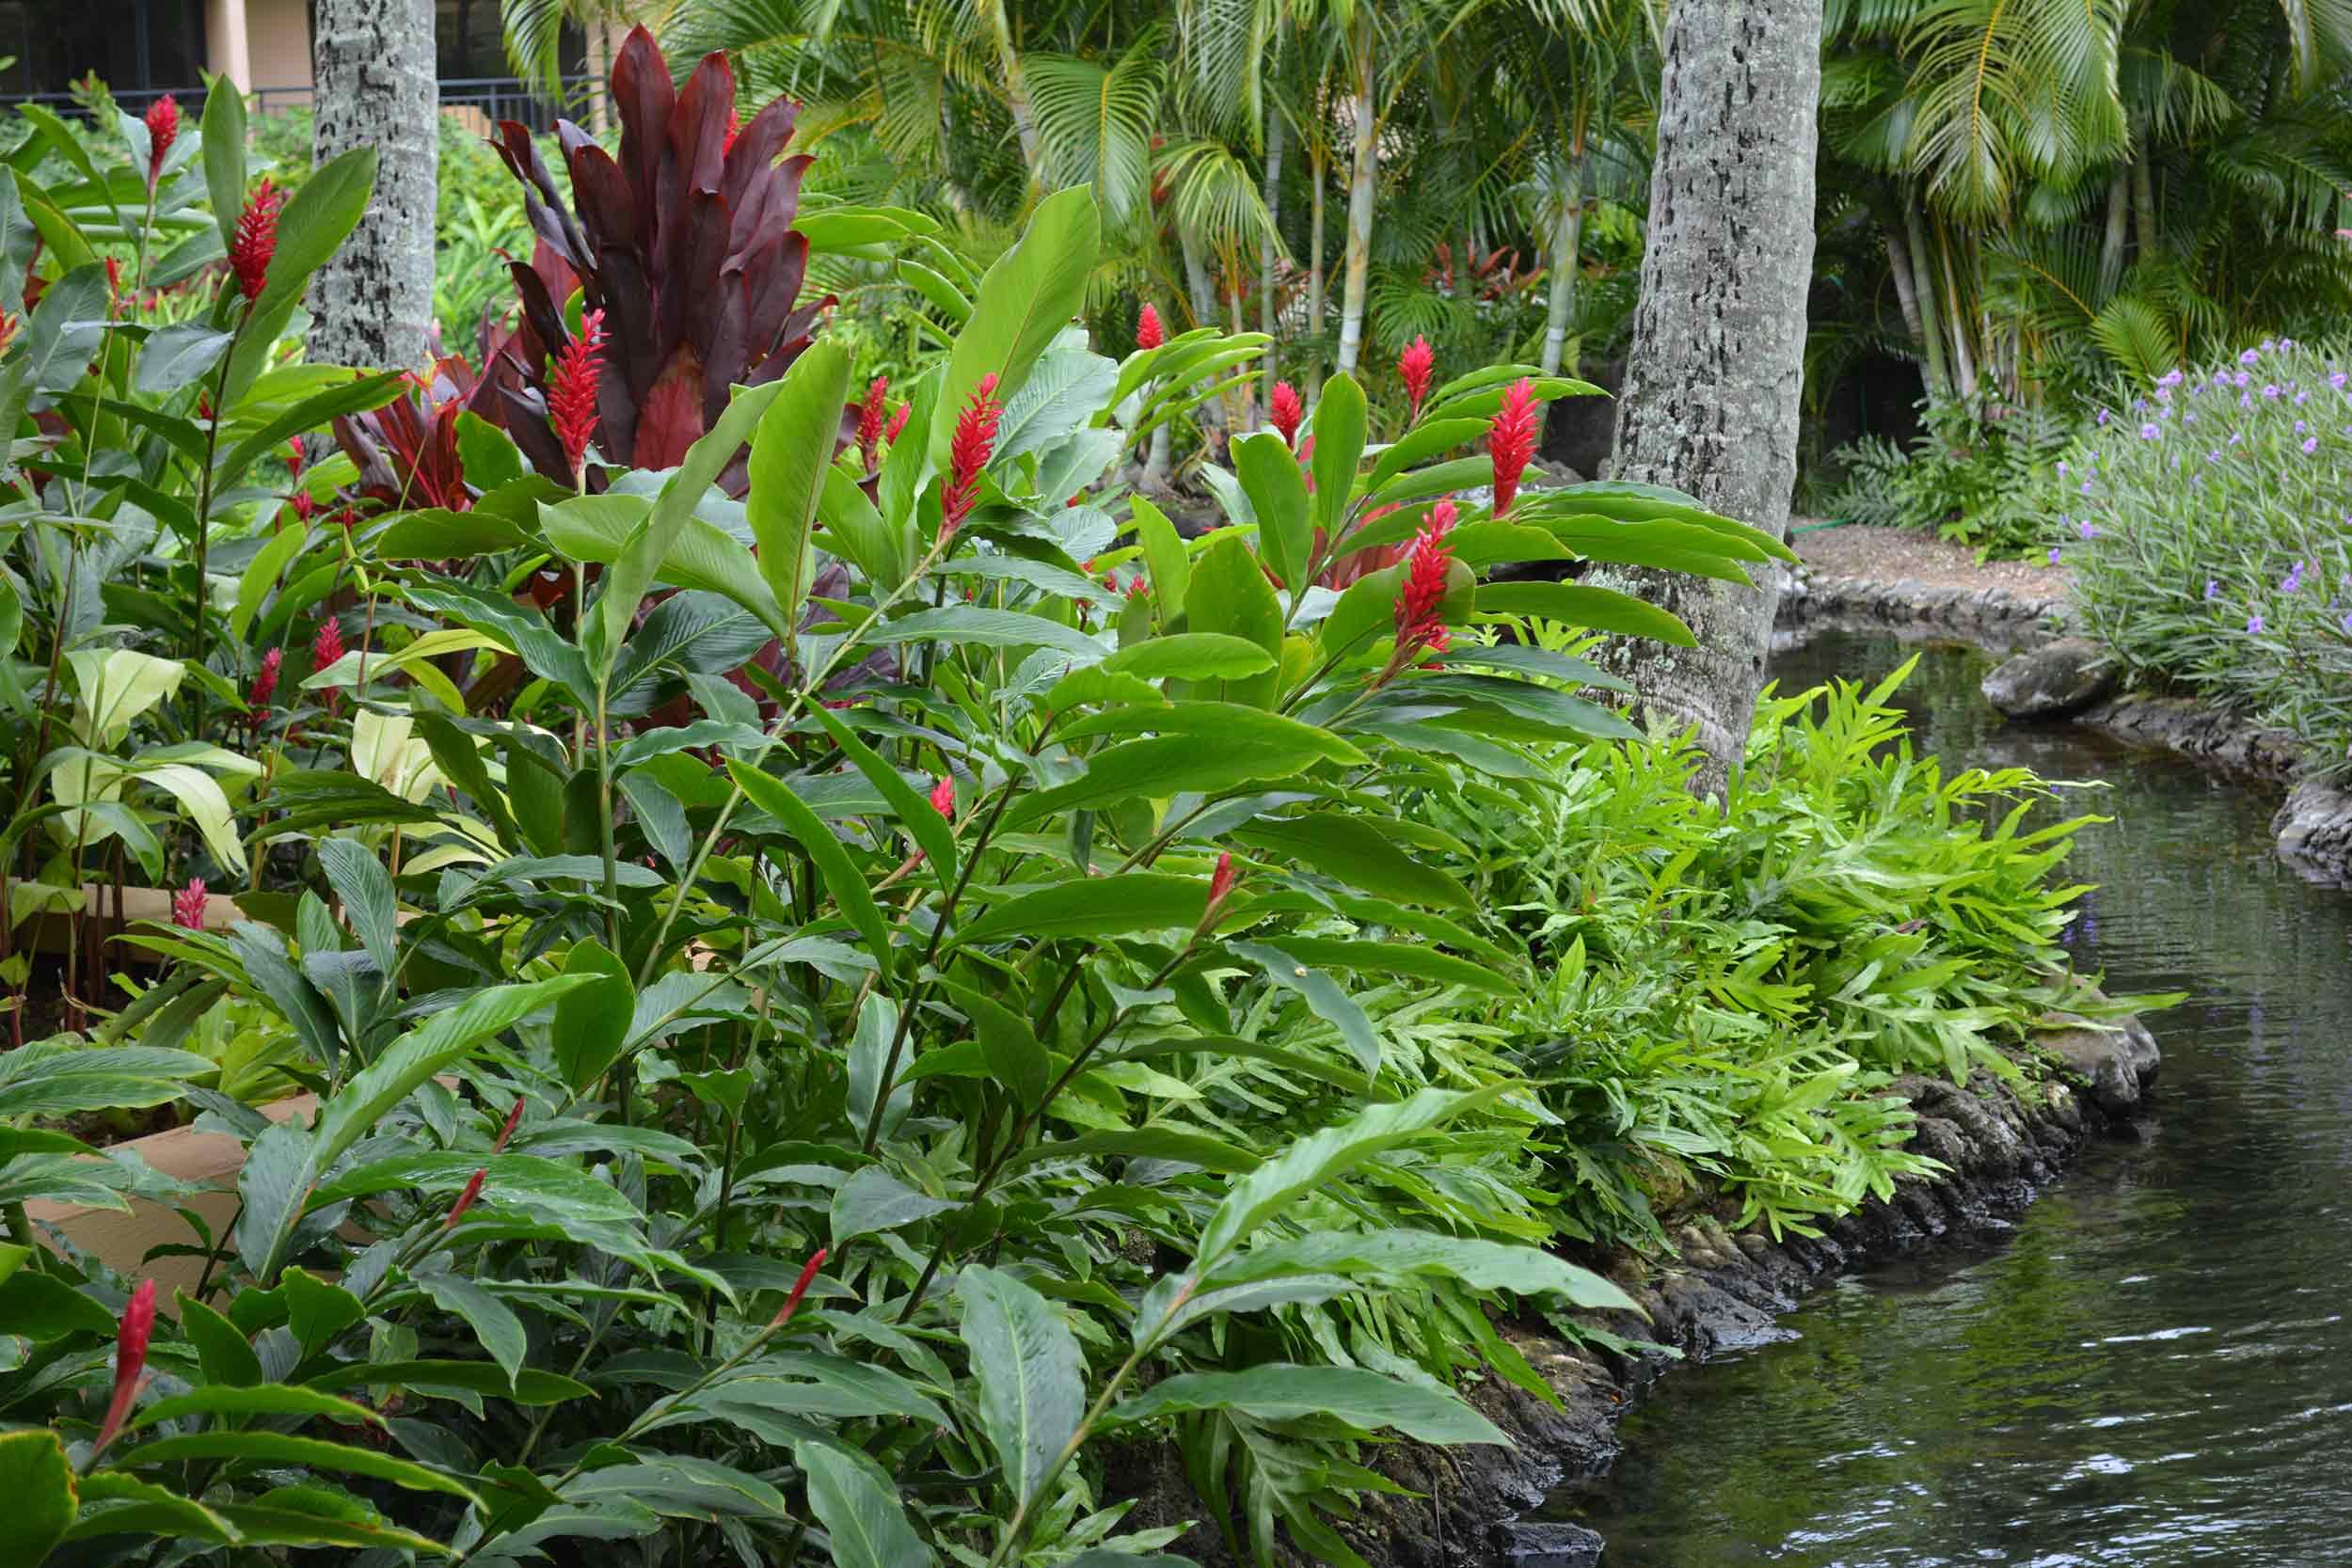 sheraton-kauai-resort-pool-landscaping-koloa-hi-3.jpg